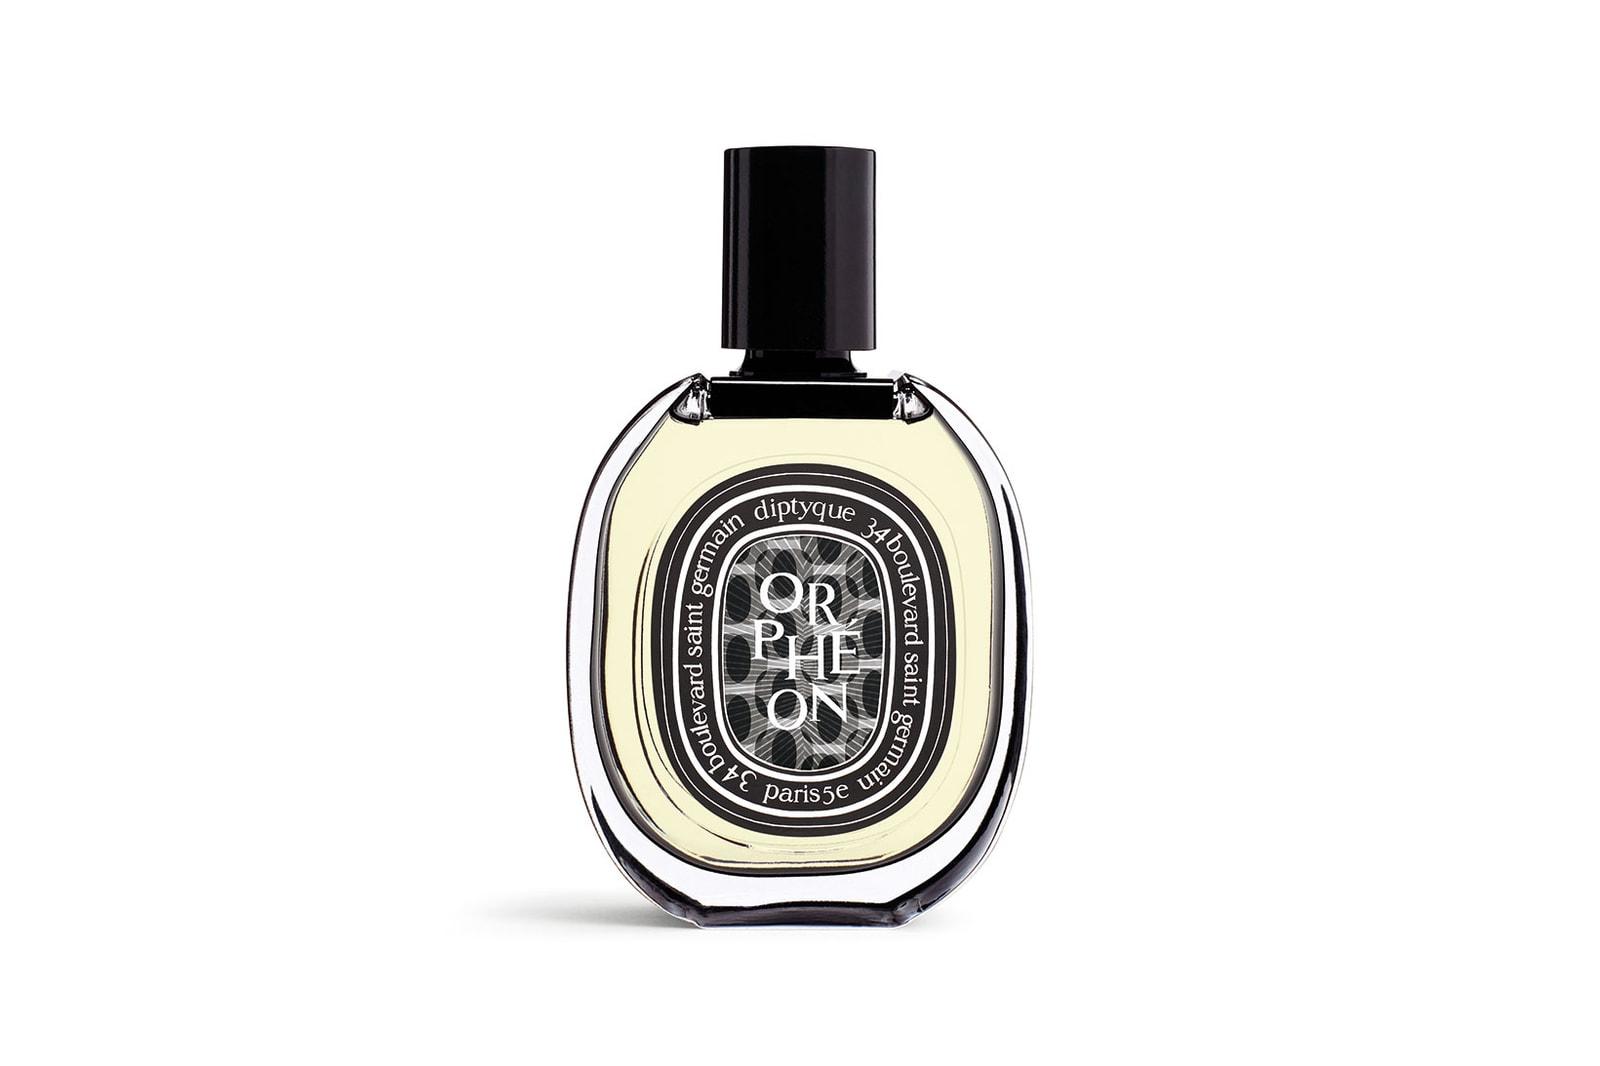 diptyque orpheon eau de parfum perfume fragrance floral woody